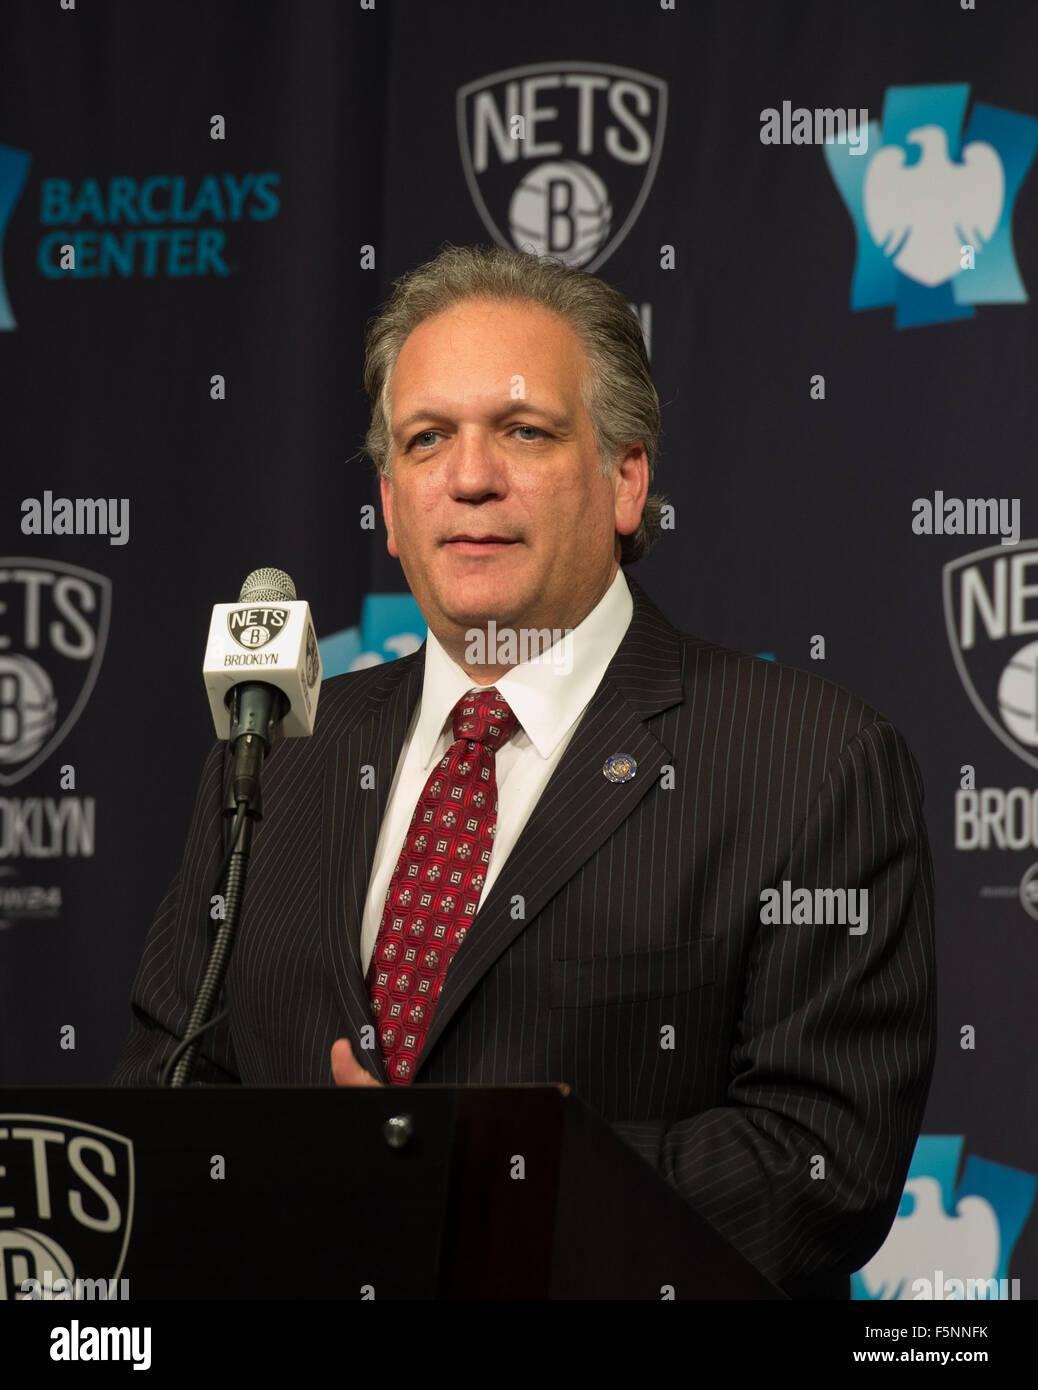 New York, NY, USA. 6th Nov, 2015. Nassau County Executive ED MANGANO speaks as the Brooklyn Nets announce they will - Stock Image